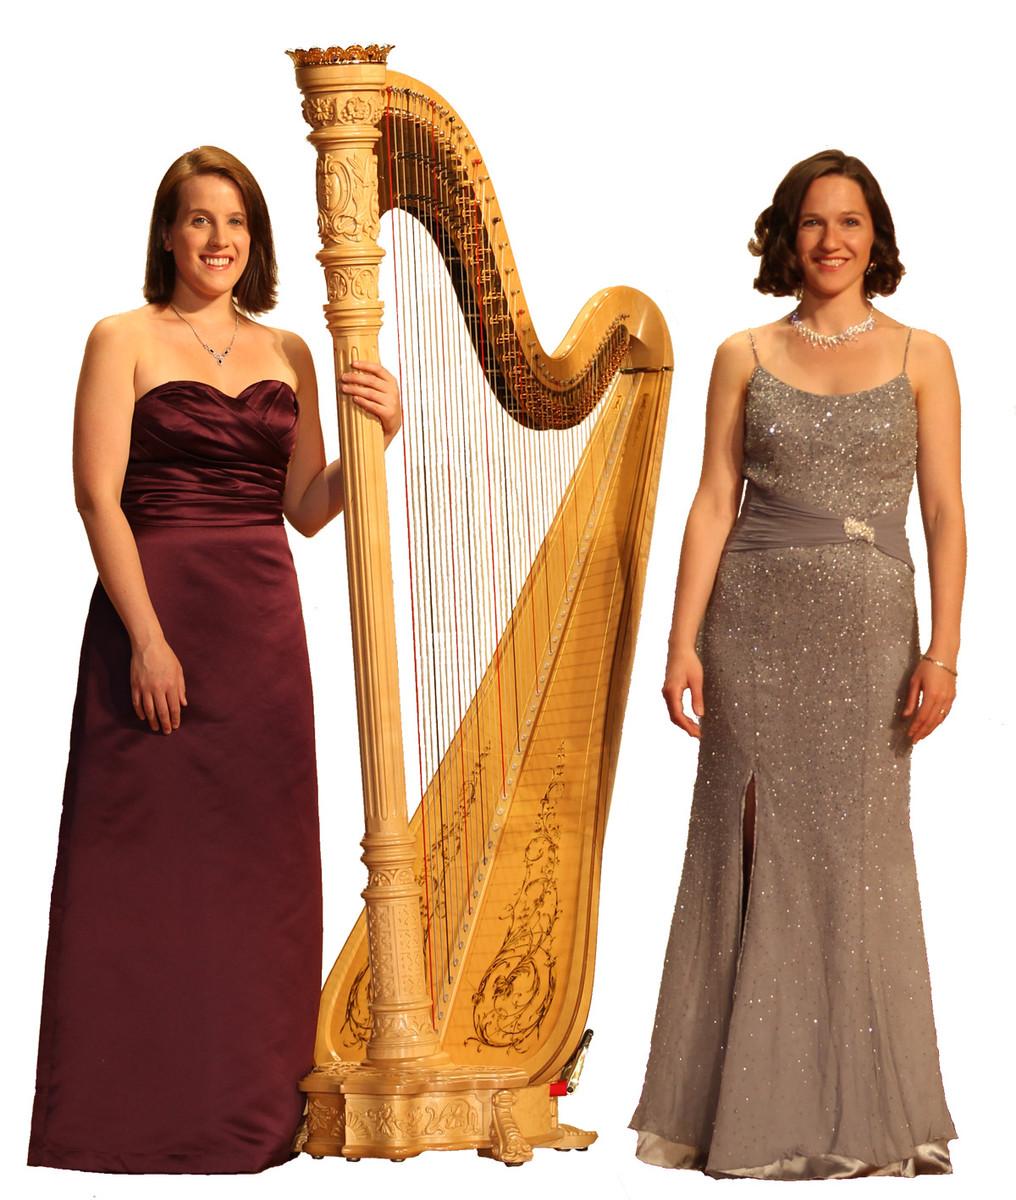 Duo bella wedding ceremony music michigan grand rapids for Wedding dresses in kalamazoo mi